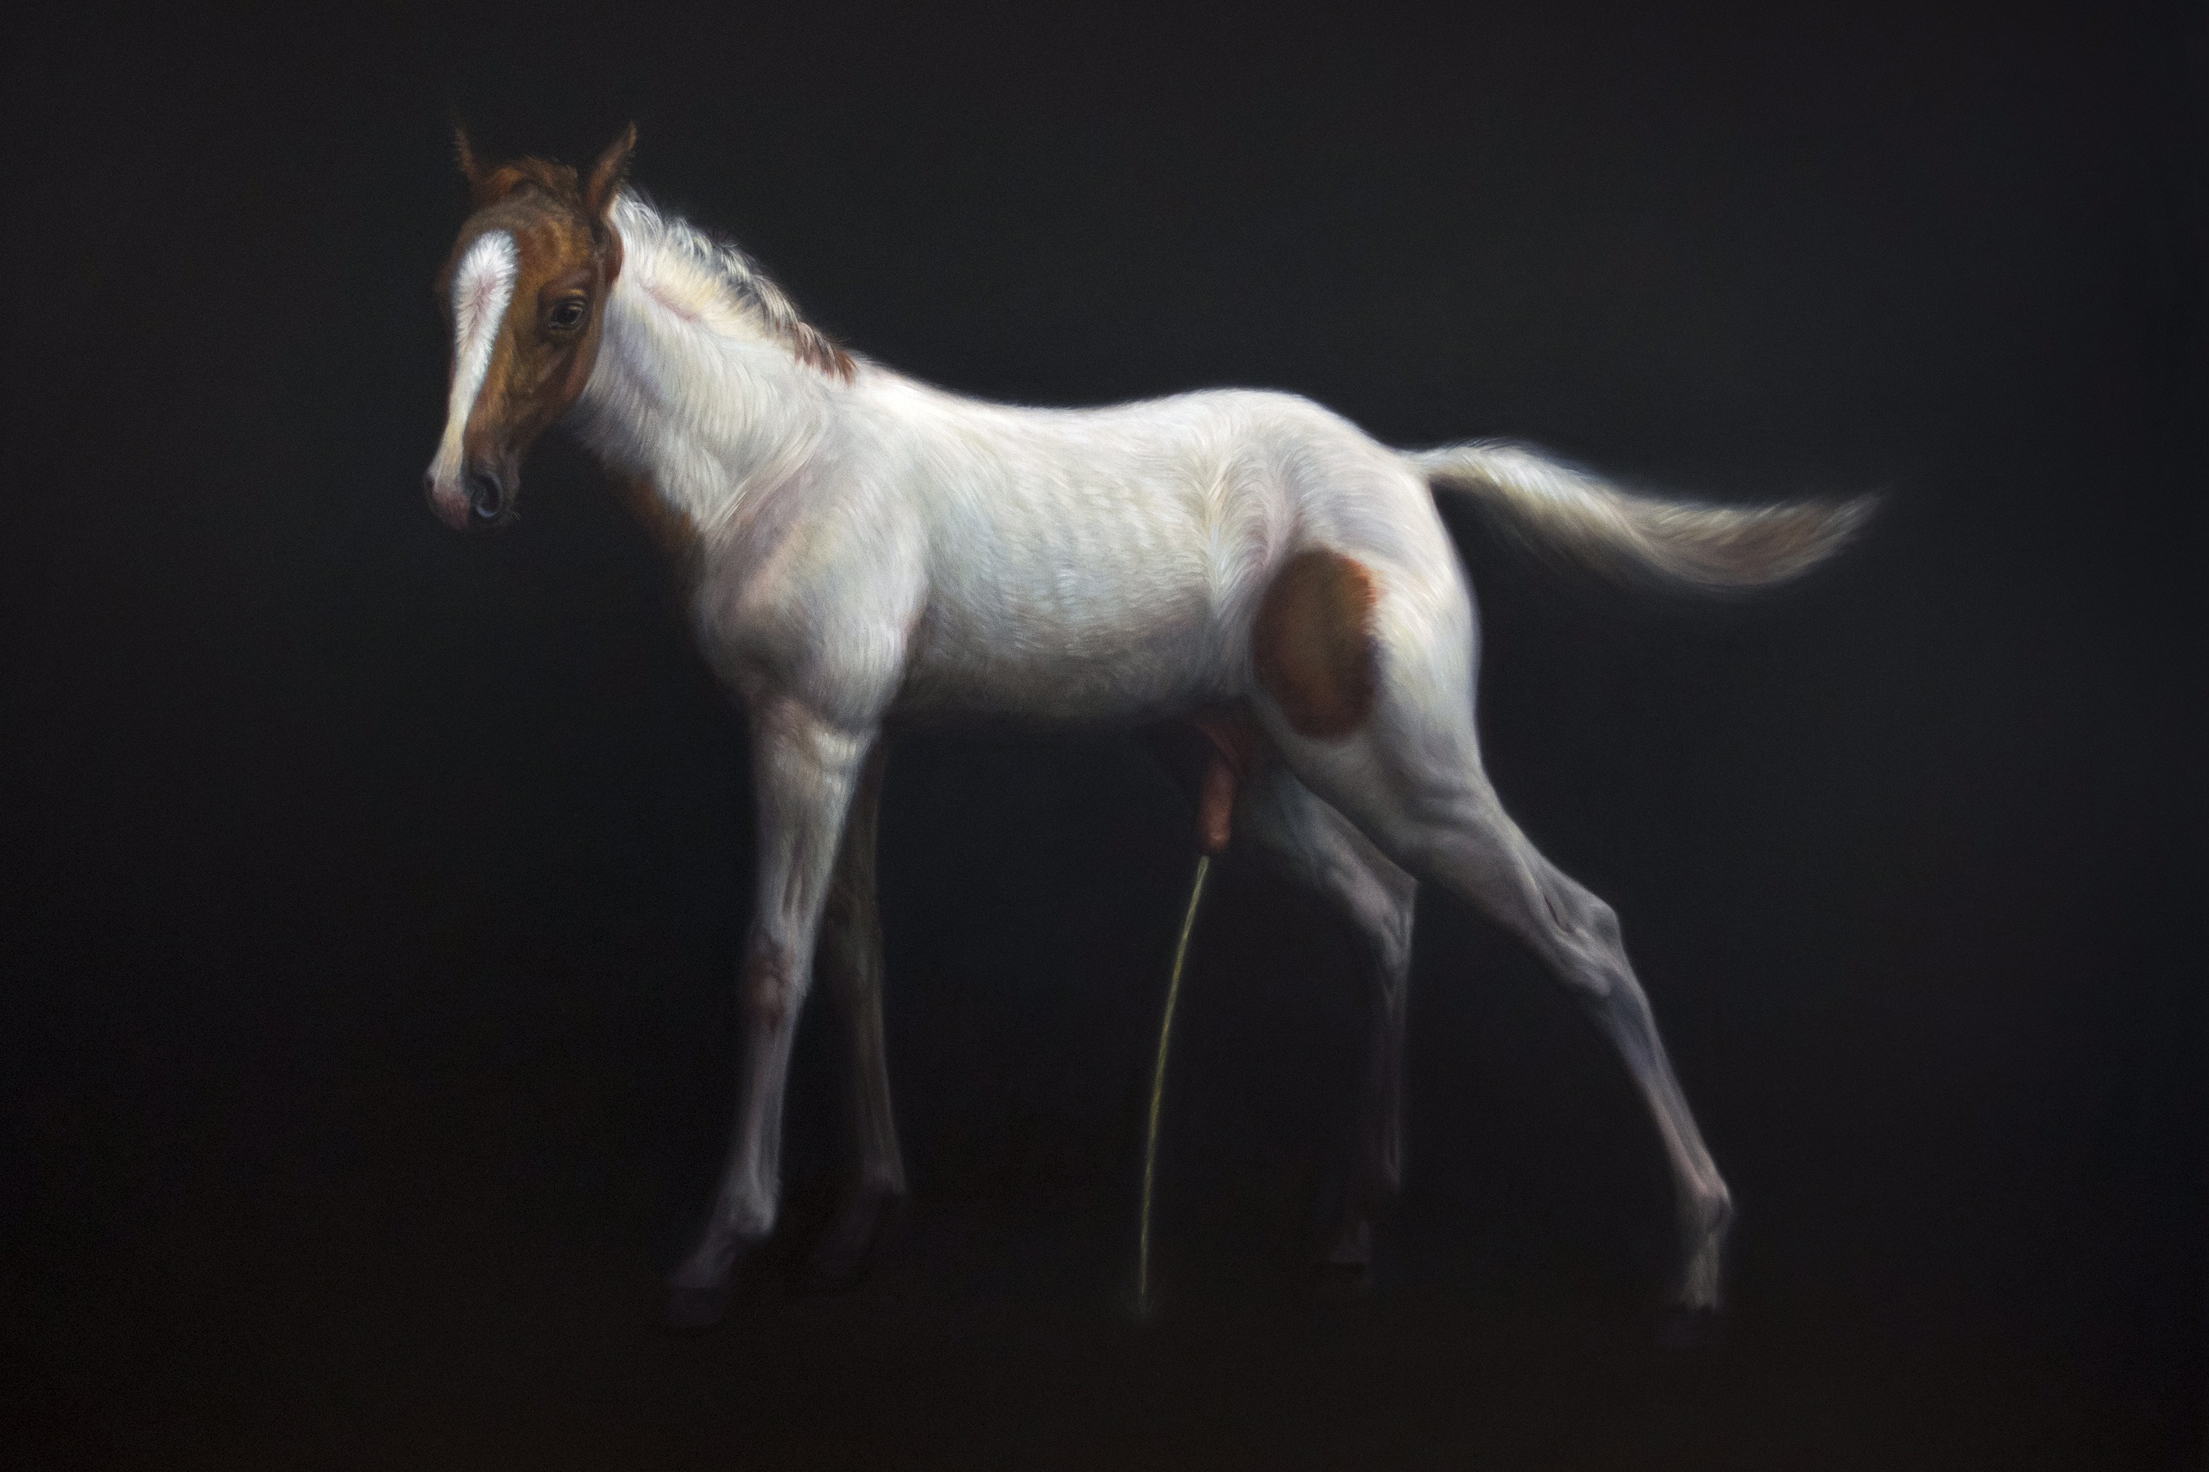 tm davy, horse (xx), 79x992.jpg